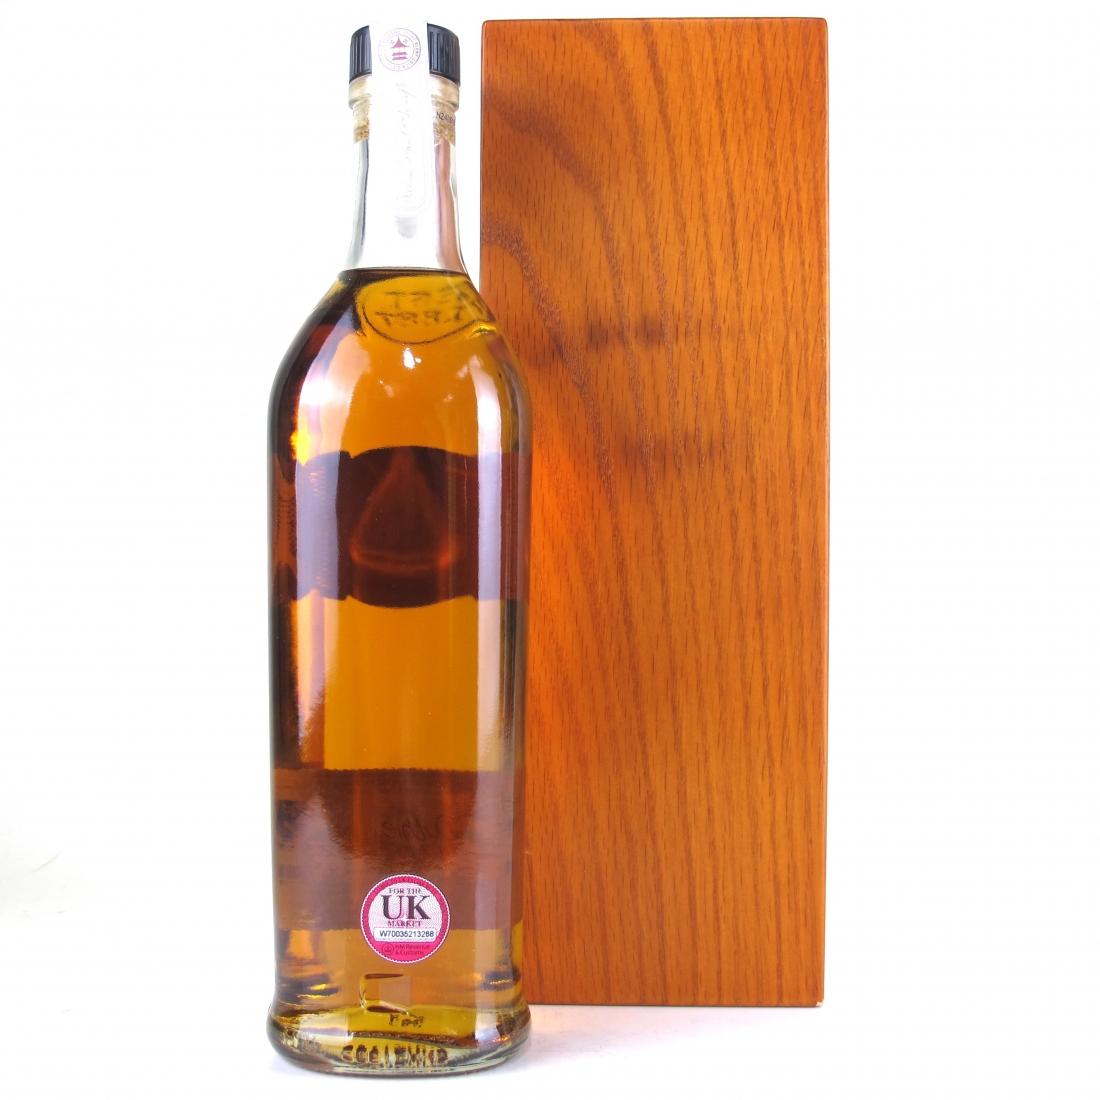 Glenfiddich 15 Year Old Hand Filled Batch #49 / Distillery Exclusive